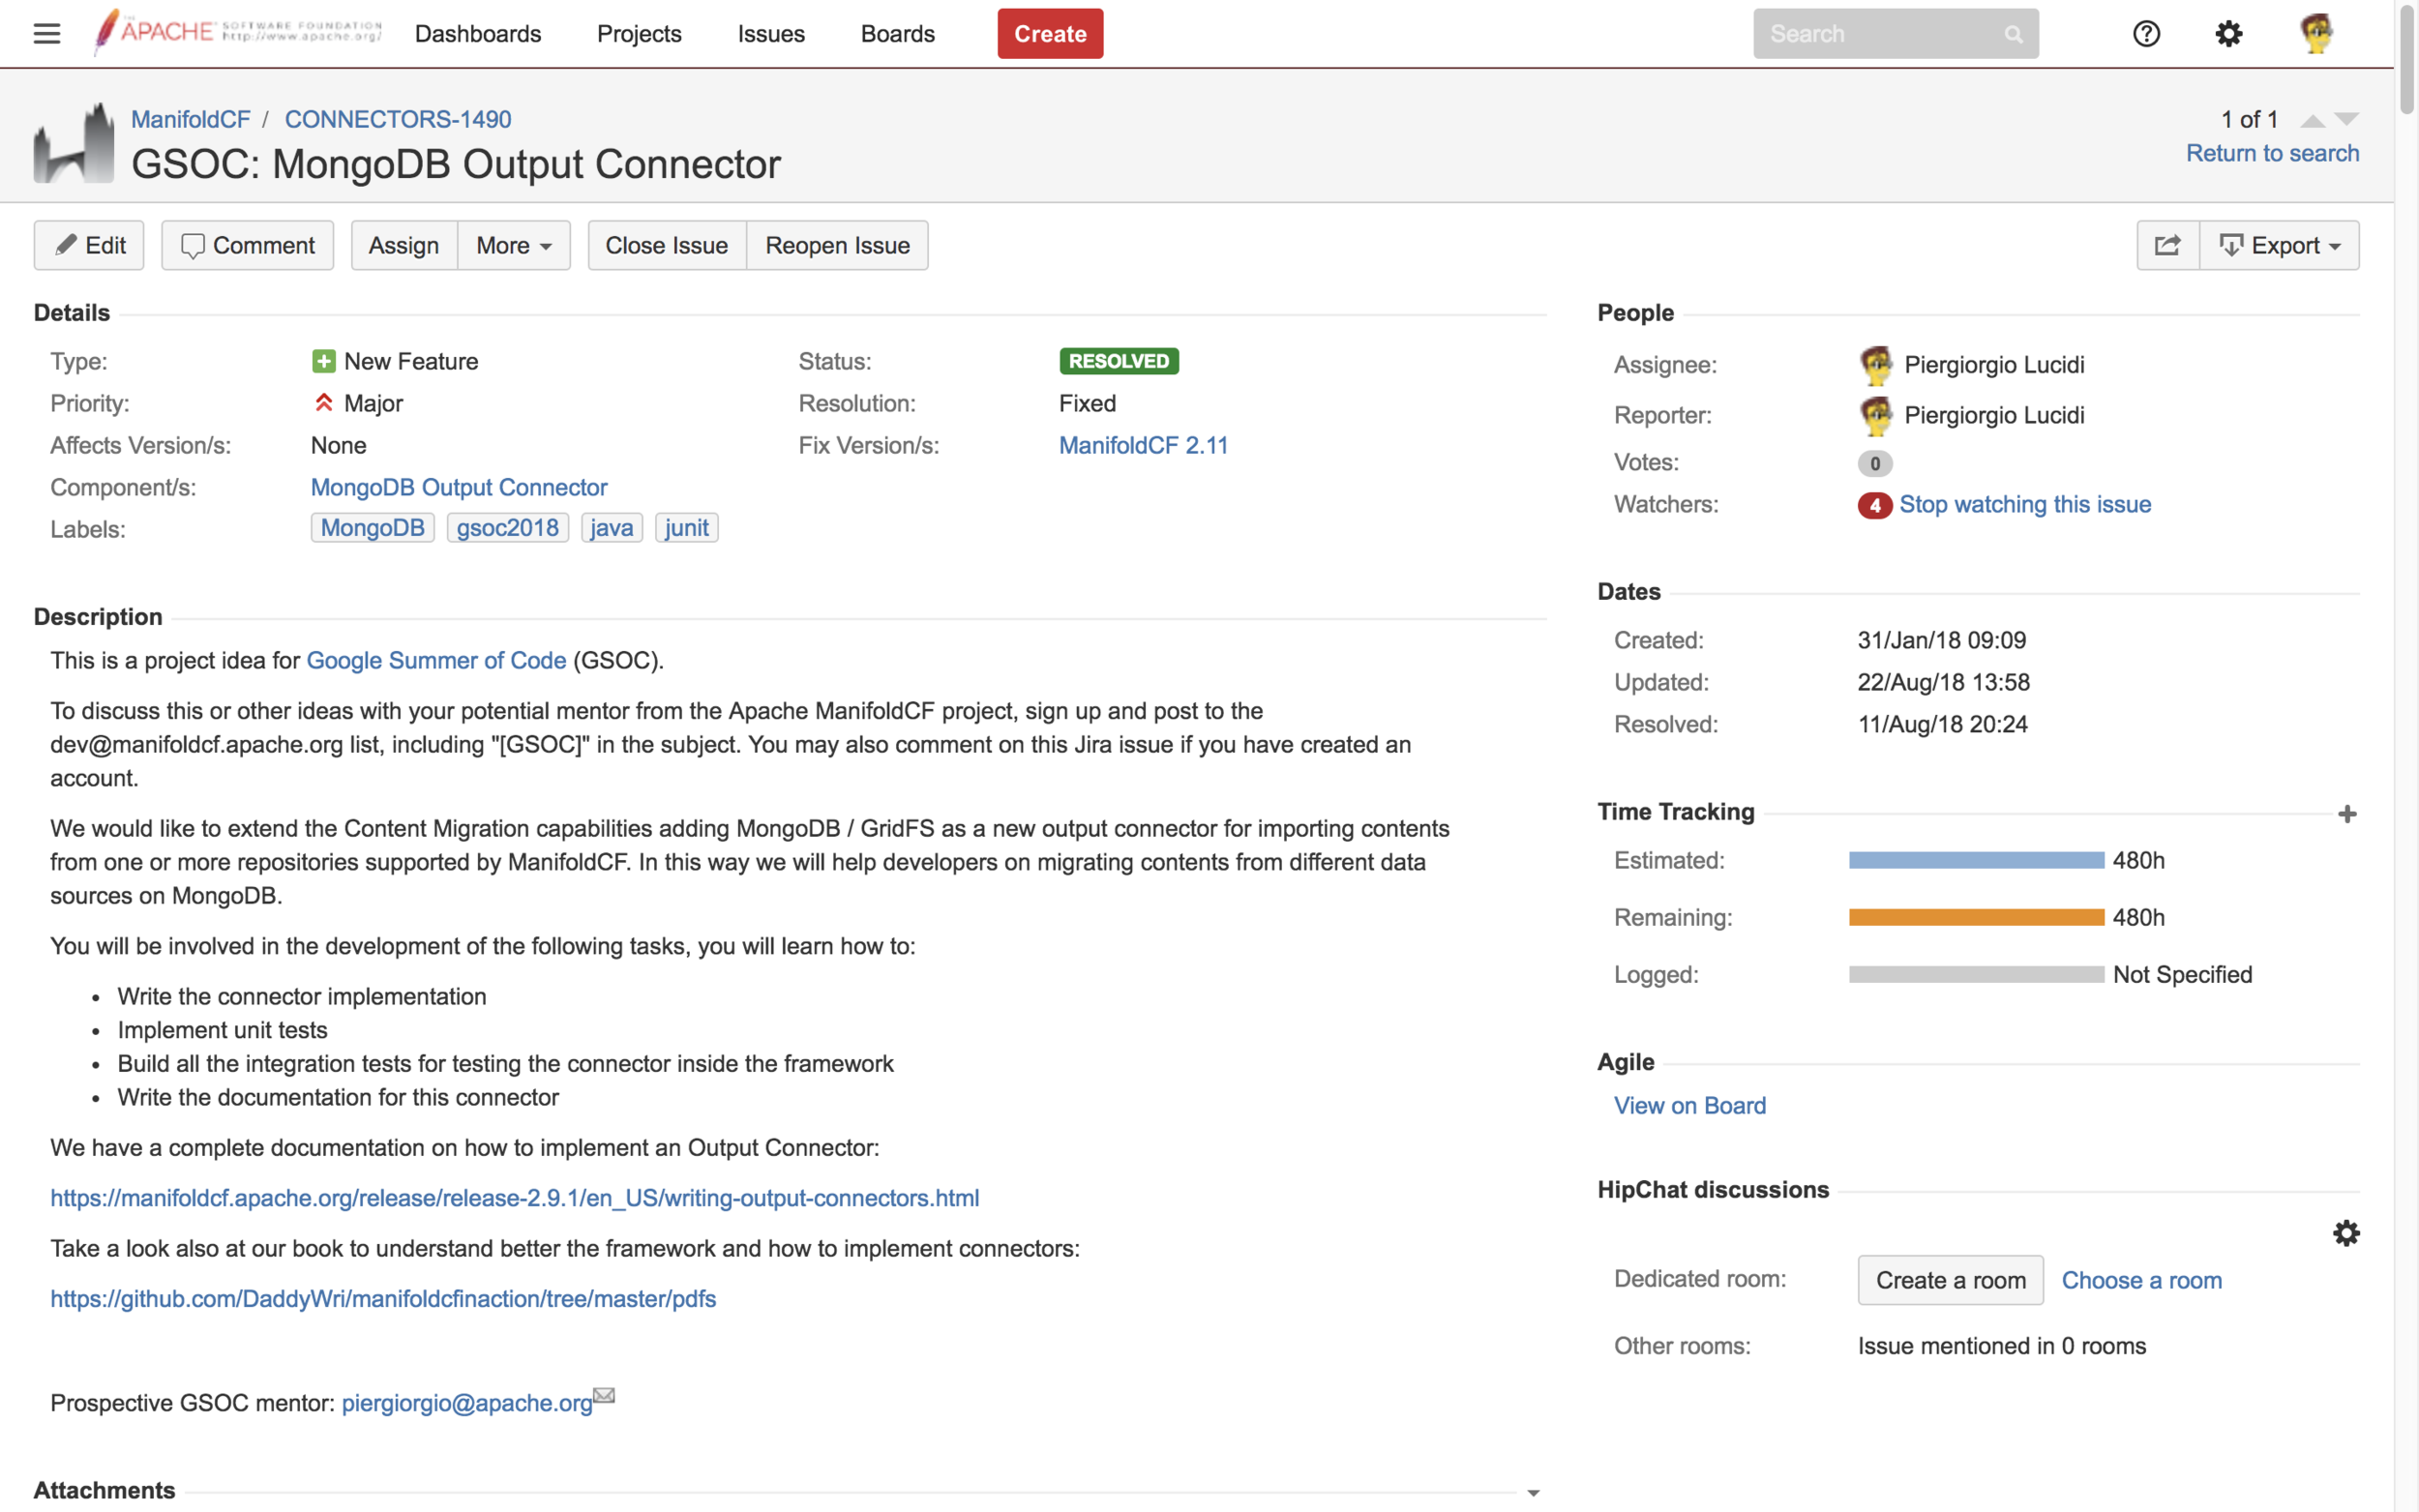 GSoC: MongoDB Output Connector - Apache JIRA Issue